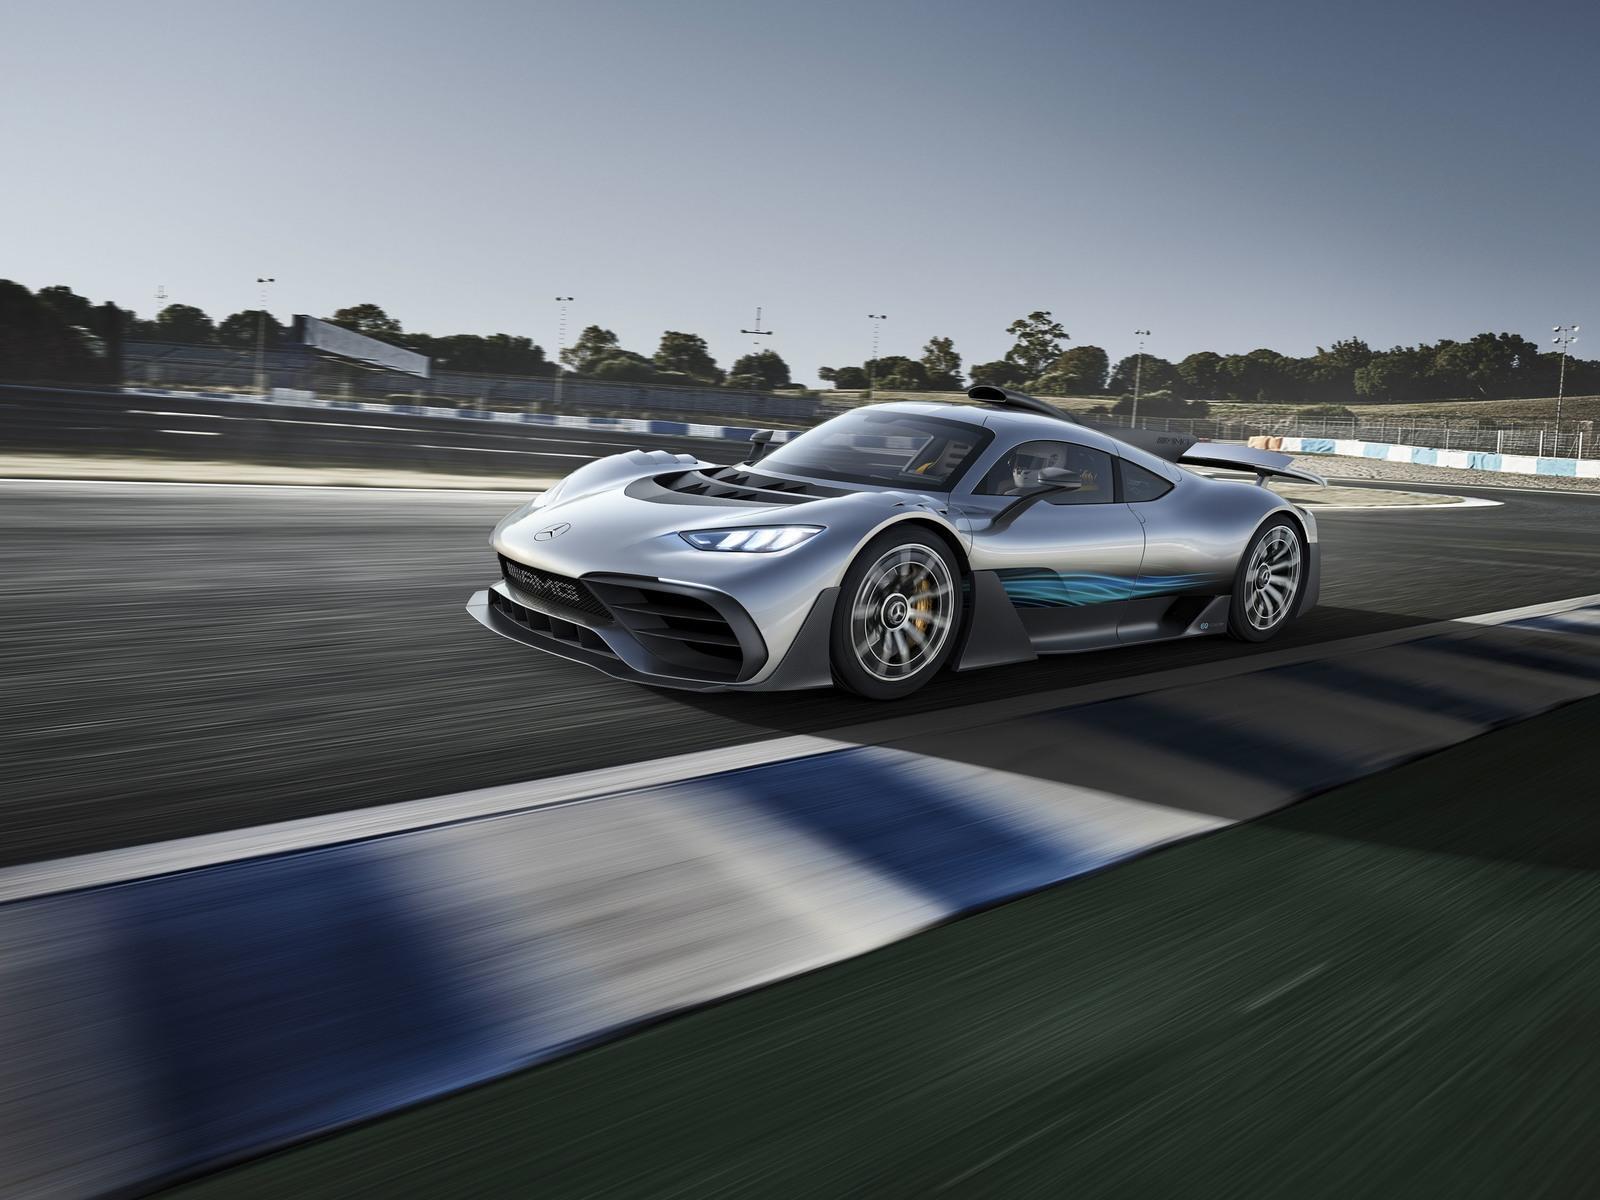 مواصفات محرك مرسيدس Mercedes Project